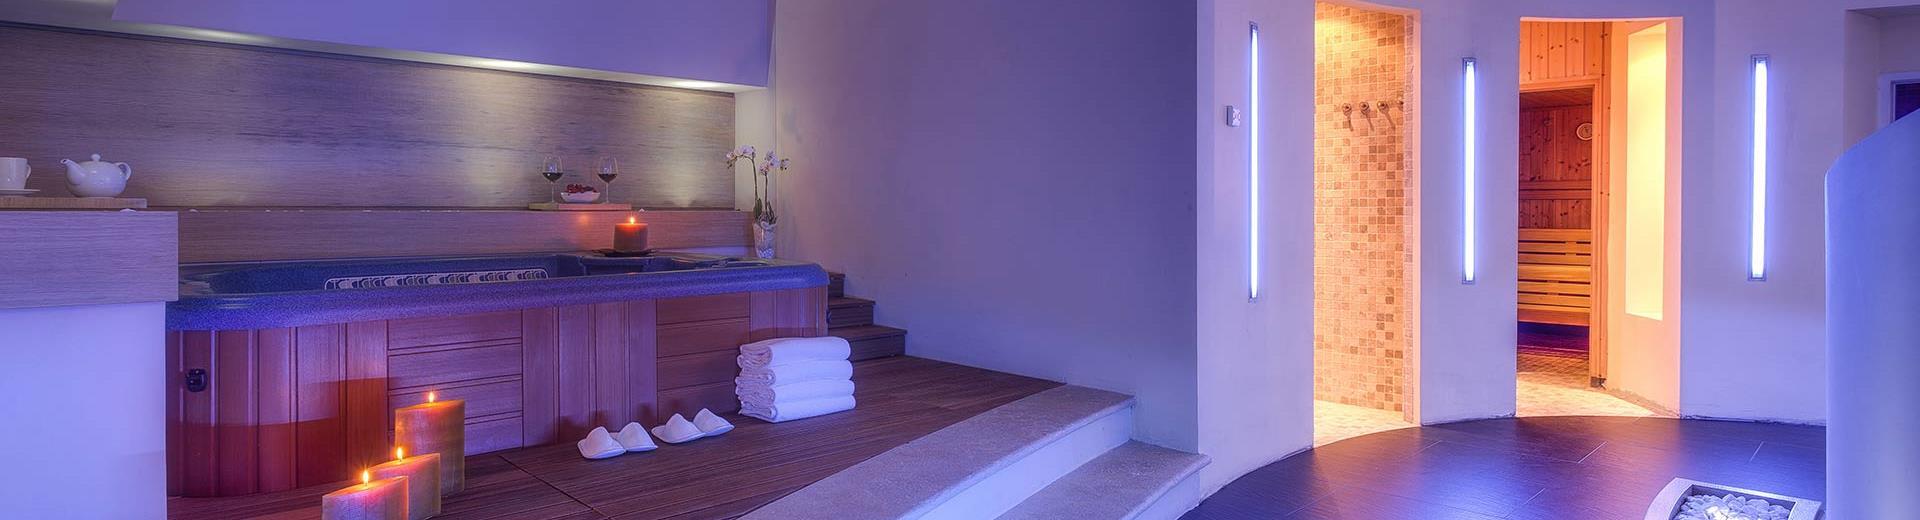 Hotel centro benessere a Siena - BW Hotel San Marco